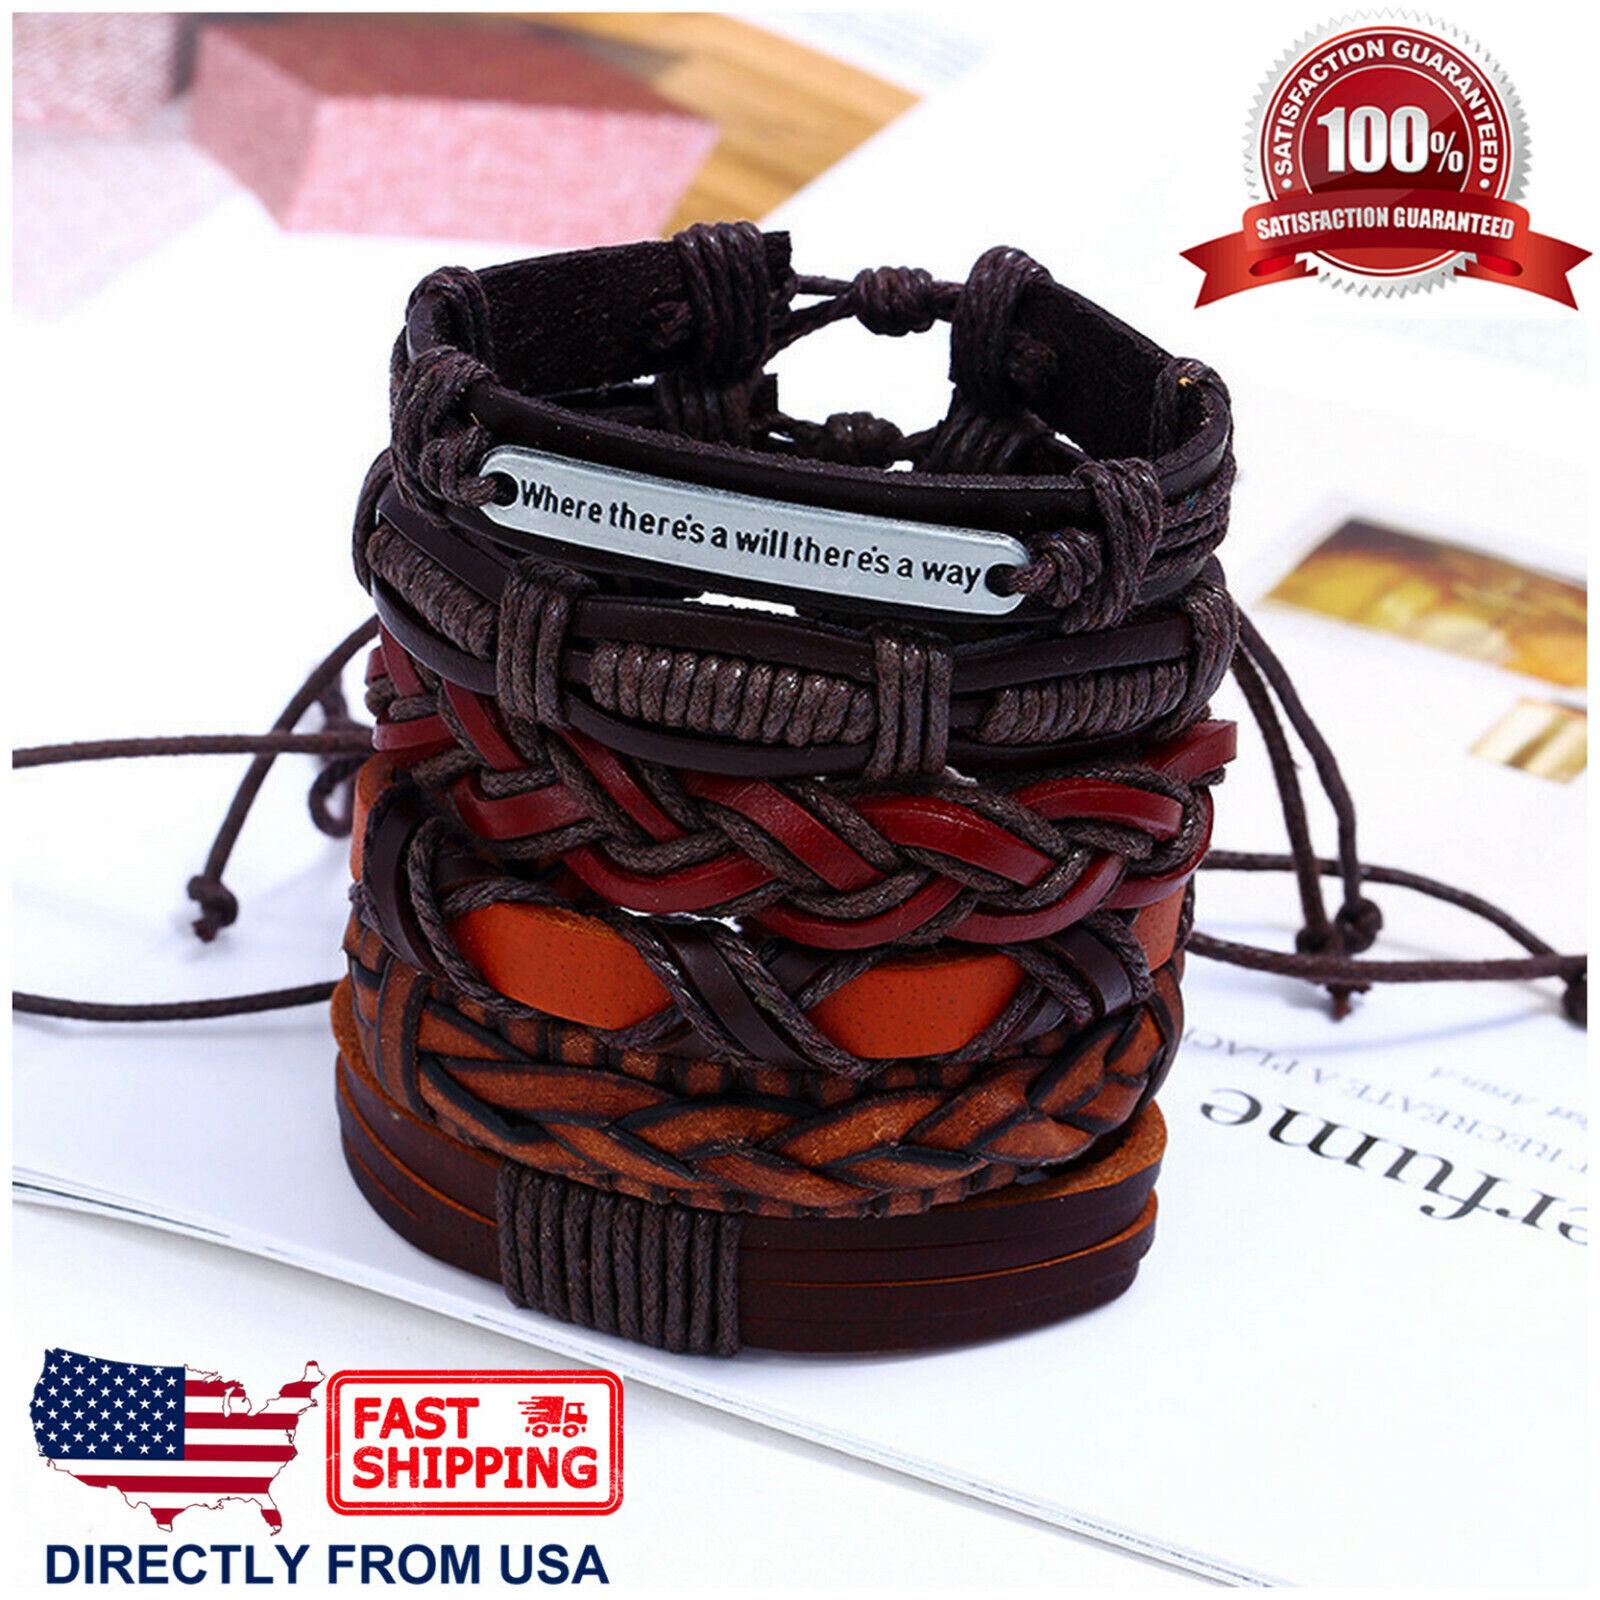 6pcs Set Brown Orange Coffee Braided Leather Men Women Cuff Wristband Bracelet Bracelets